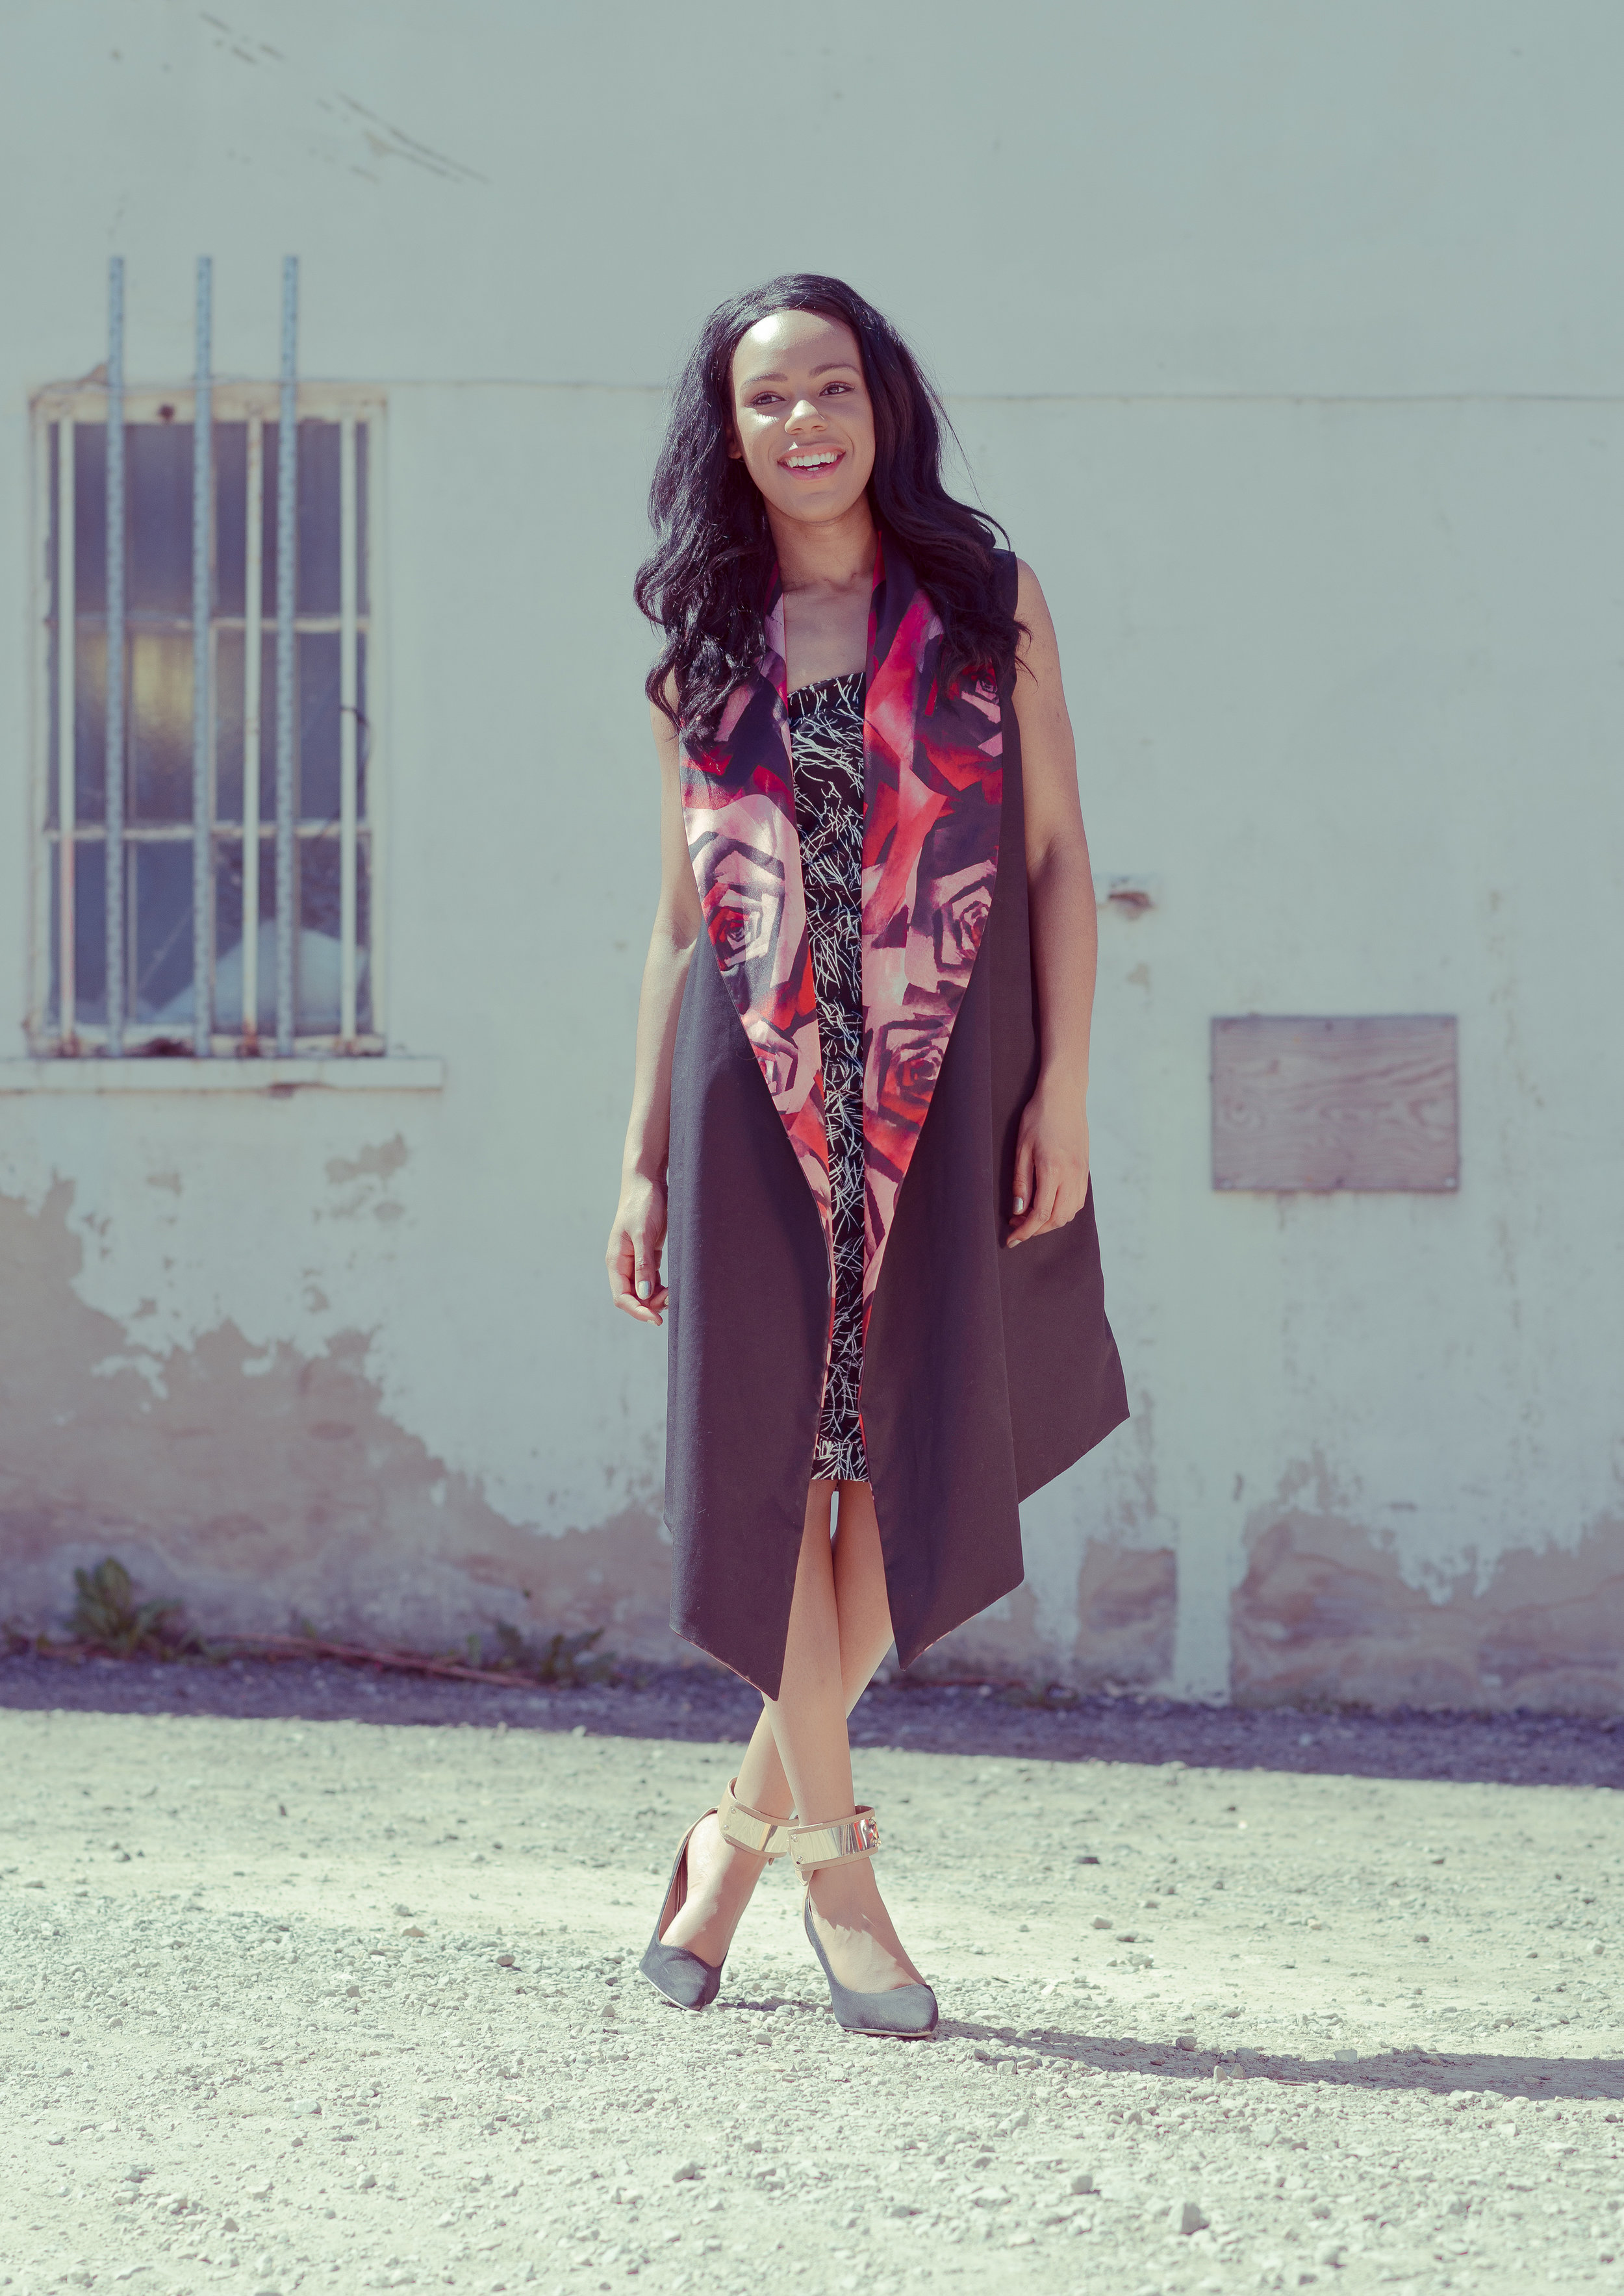 zaramia-ava-zaramiaava-leeds-fashion-designer-ethical-sustainable-tailored-minimalist-emi-red-print-black-jacket-belt-point-skirt-versatile-drape-cowl-styling-womenswear-models-1